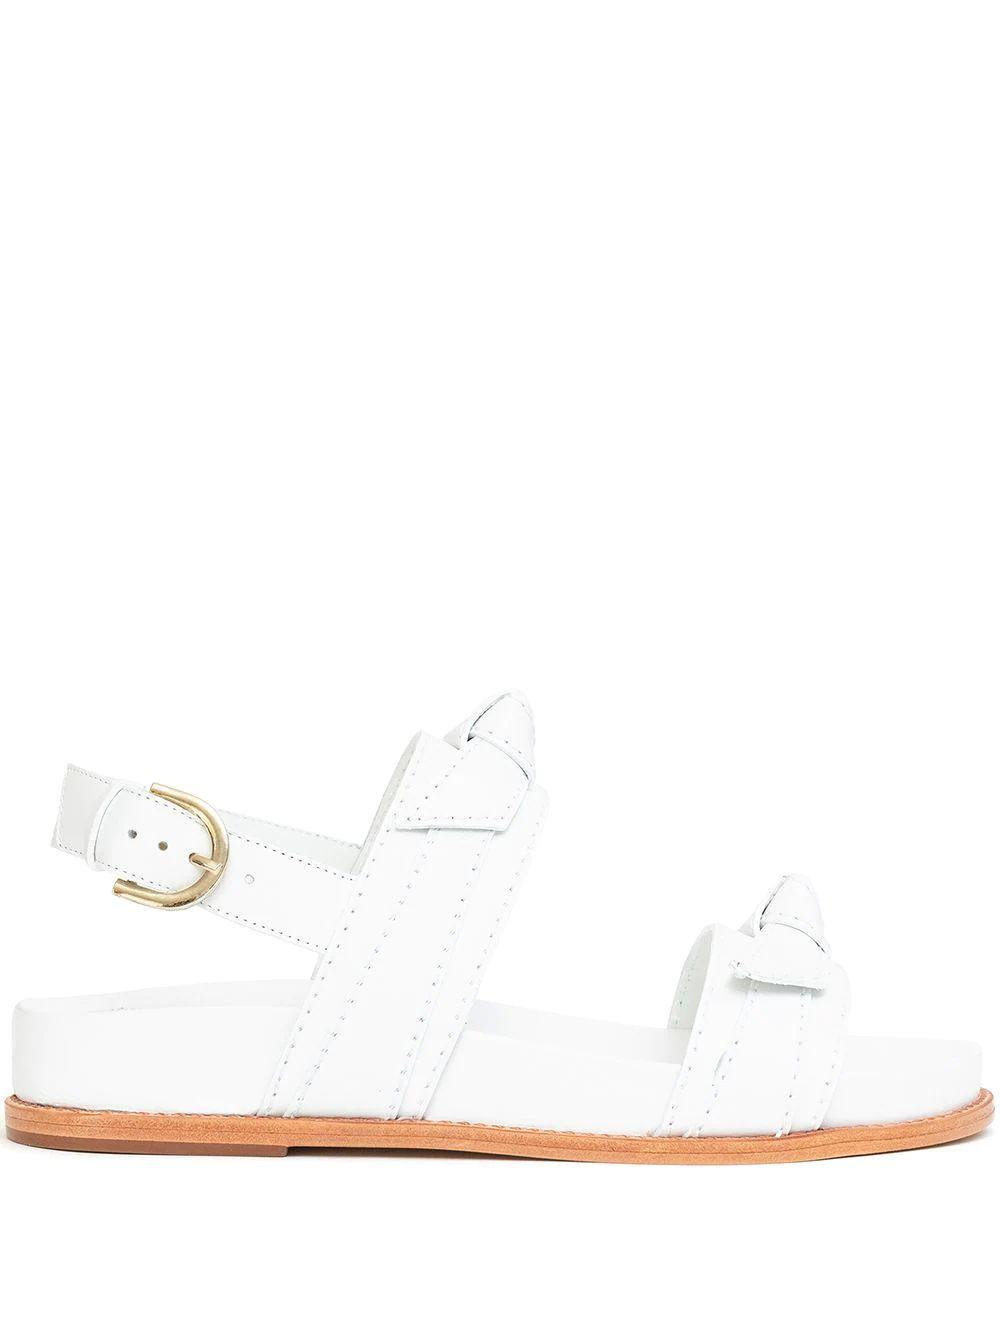 Clarita Sport Sandal